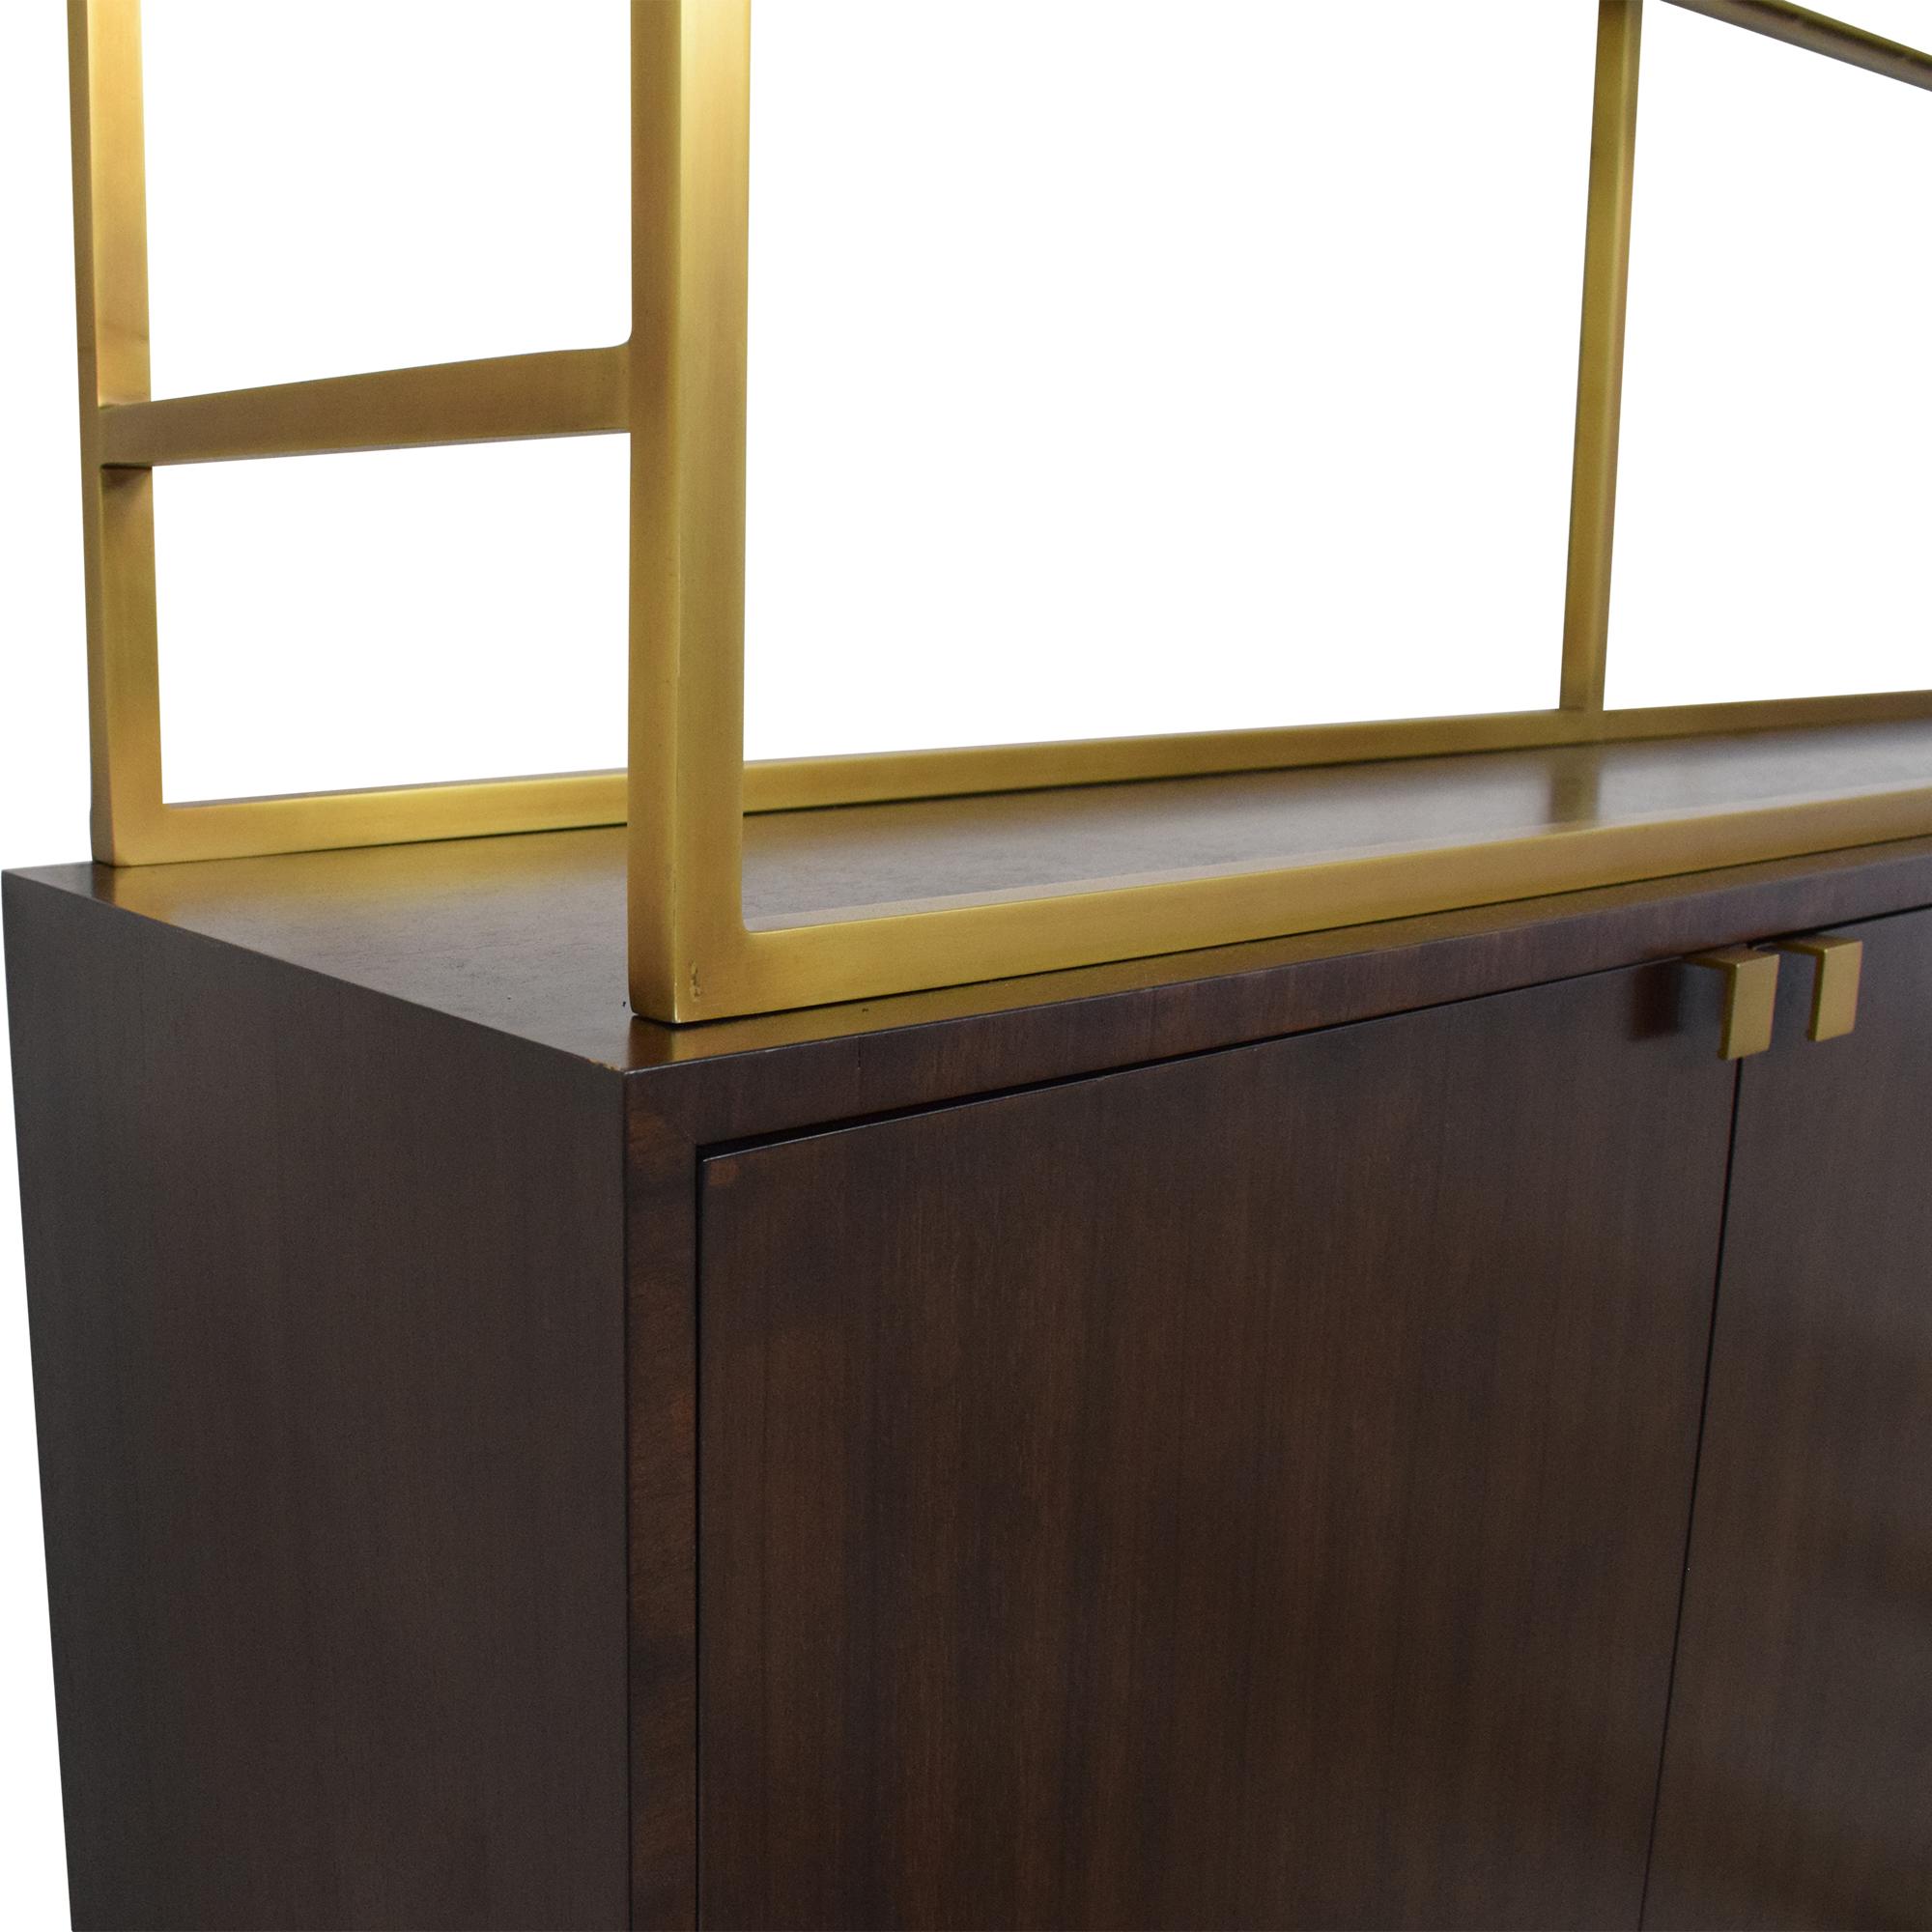 Restoration Hardware Sideboard with Etagere Style Bookcase Restoration Hardware